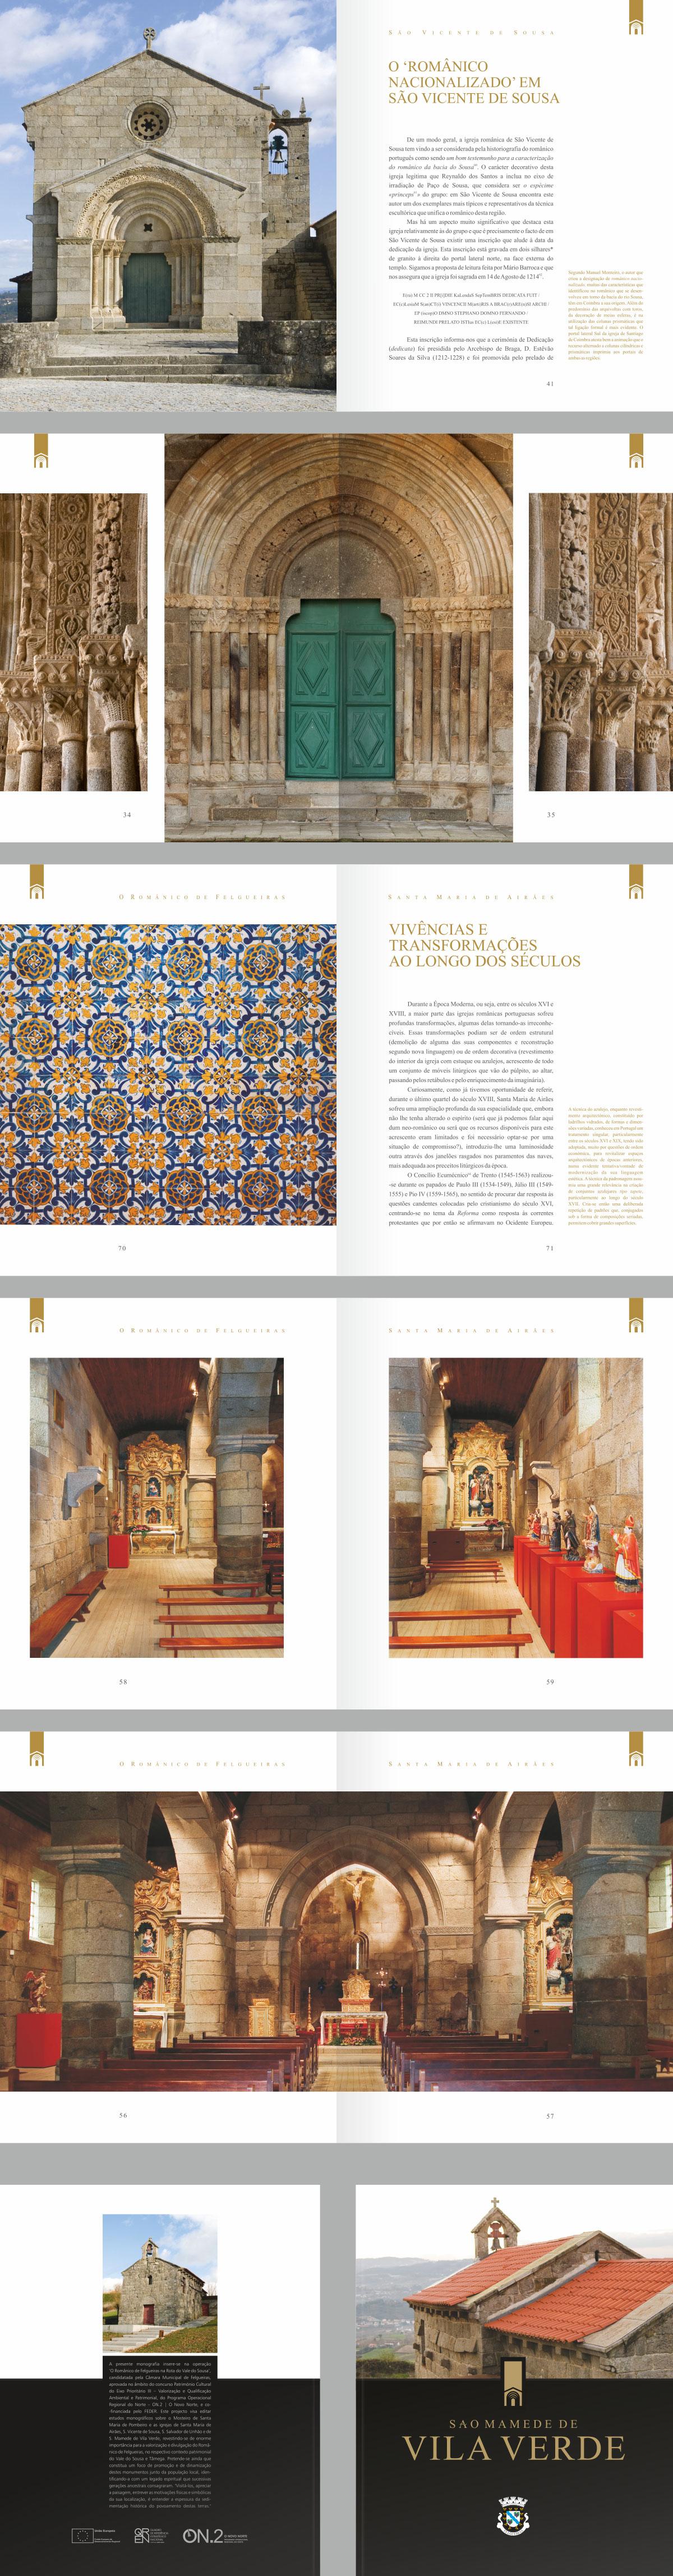 atelier_alves_ricardo_romanico_felgueiras_paginas_web